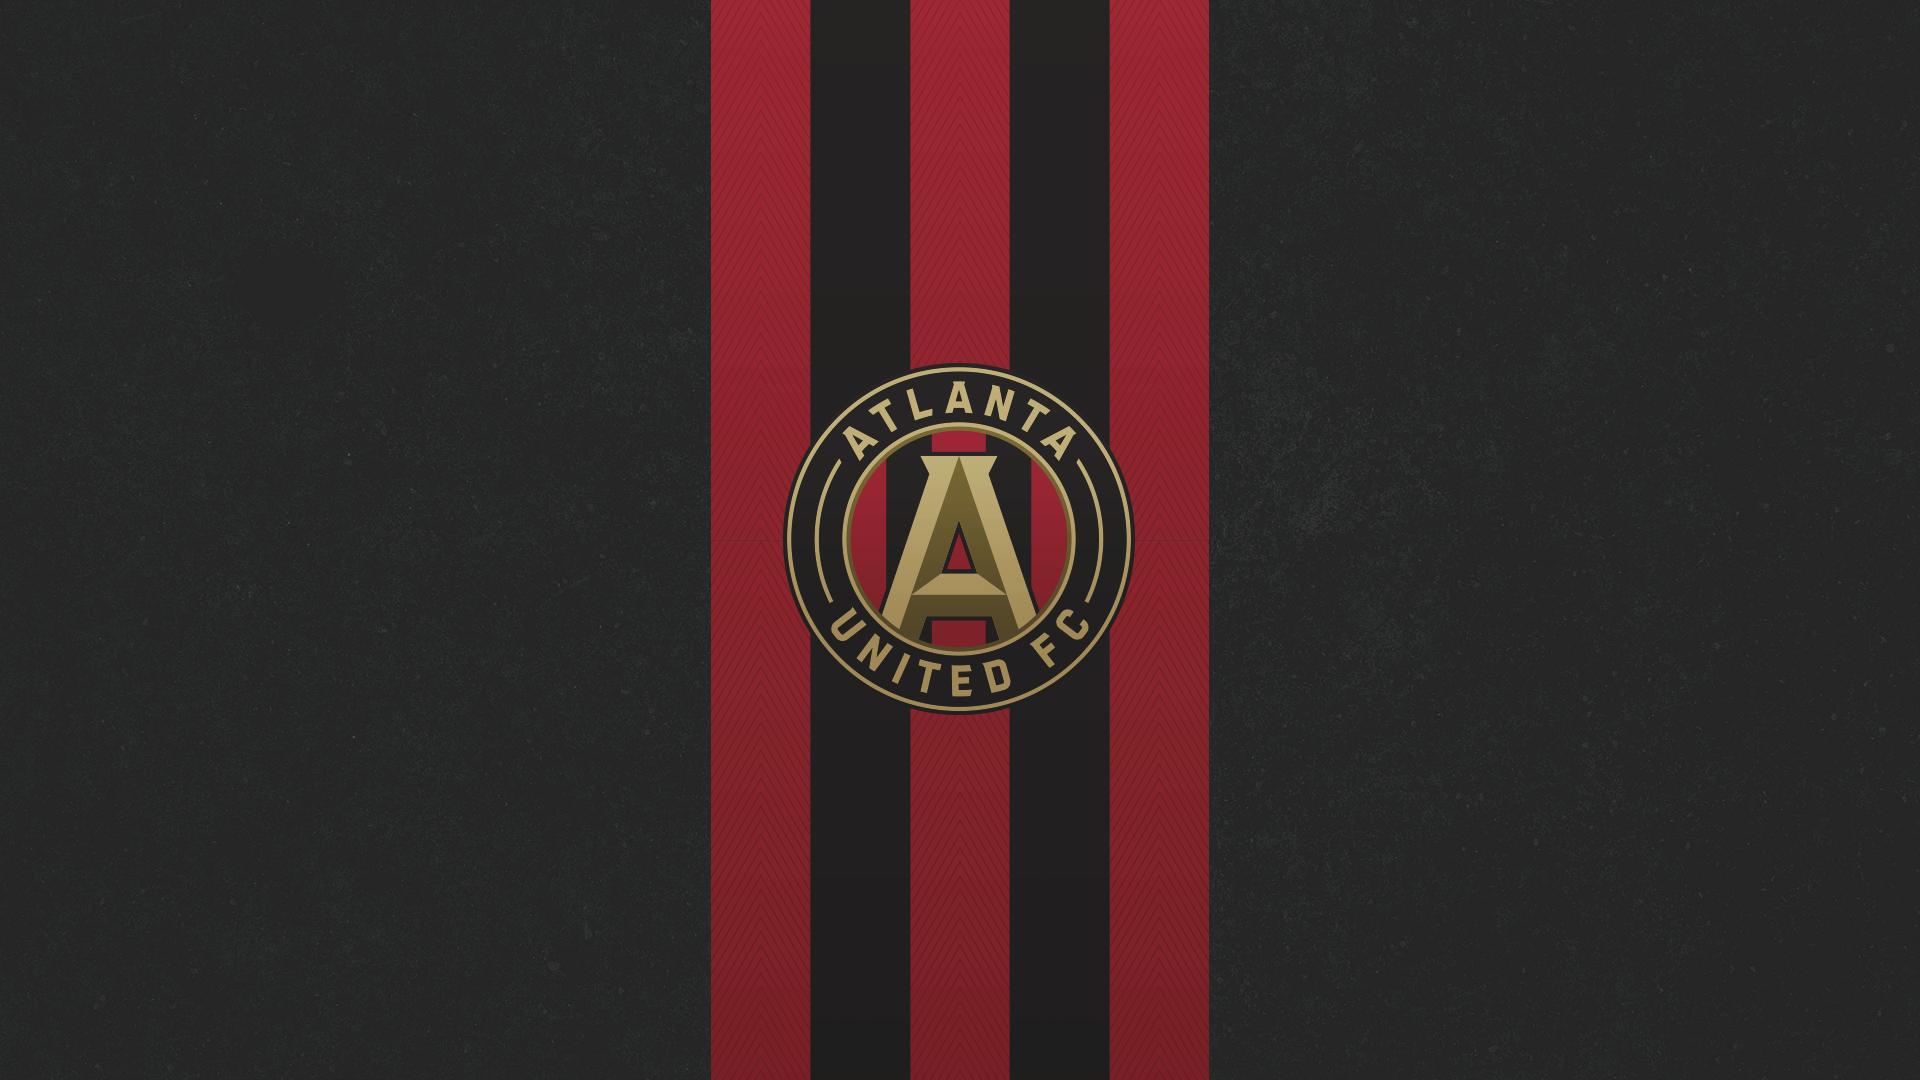 atlanta united